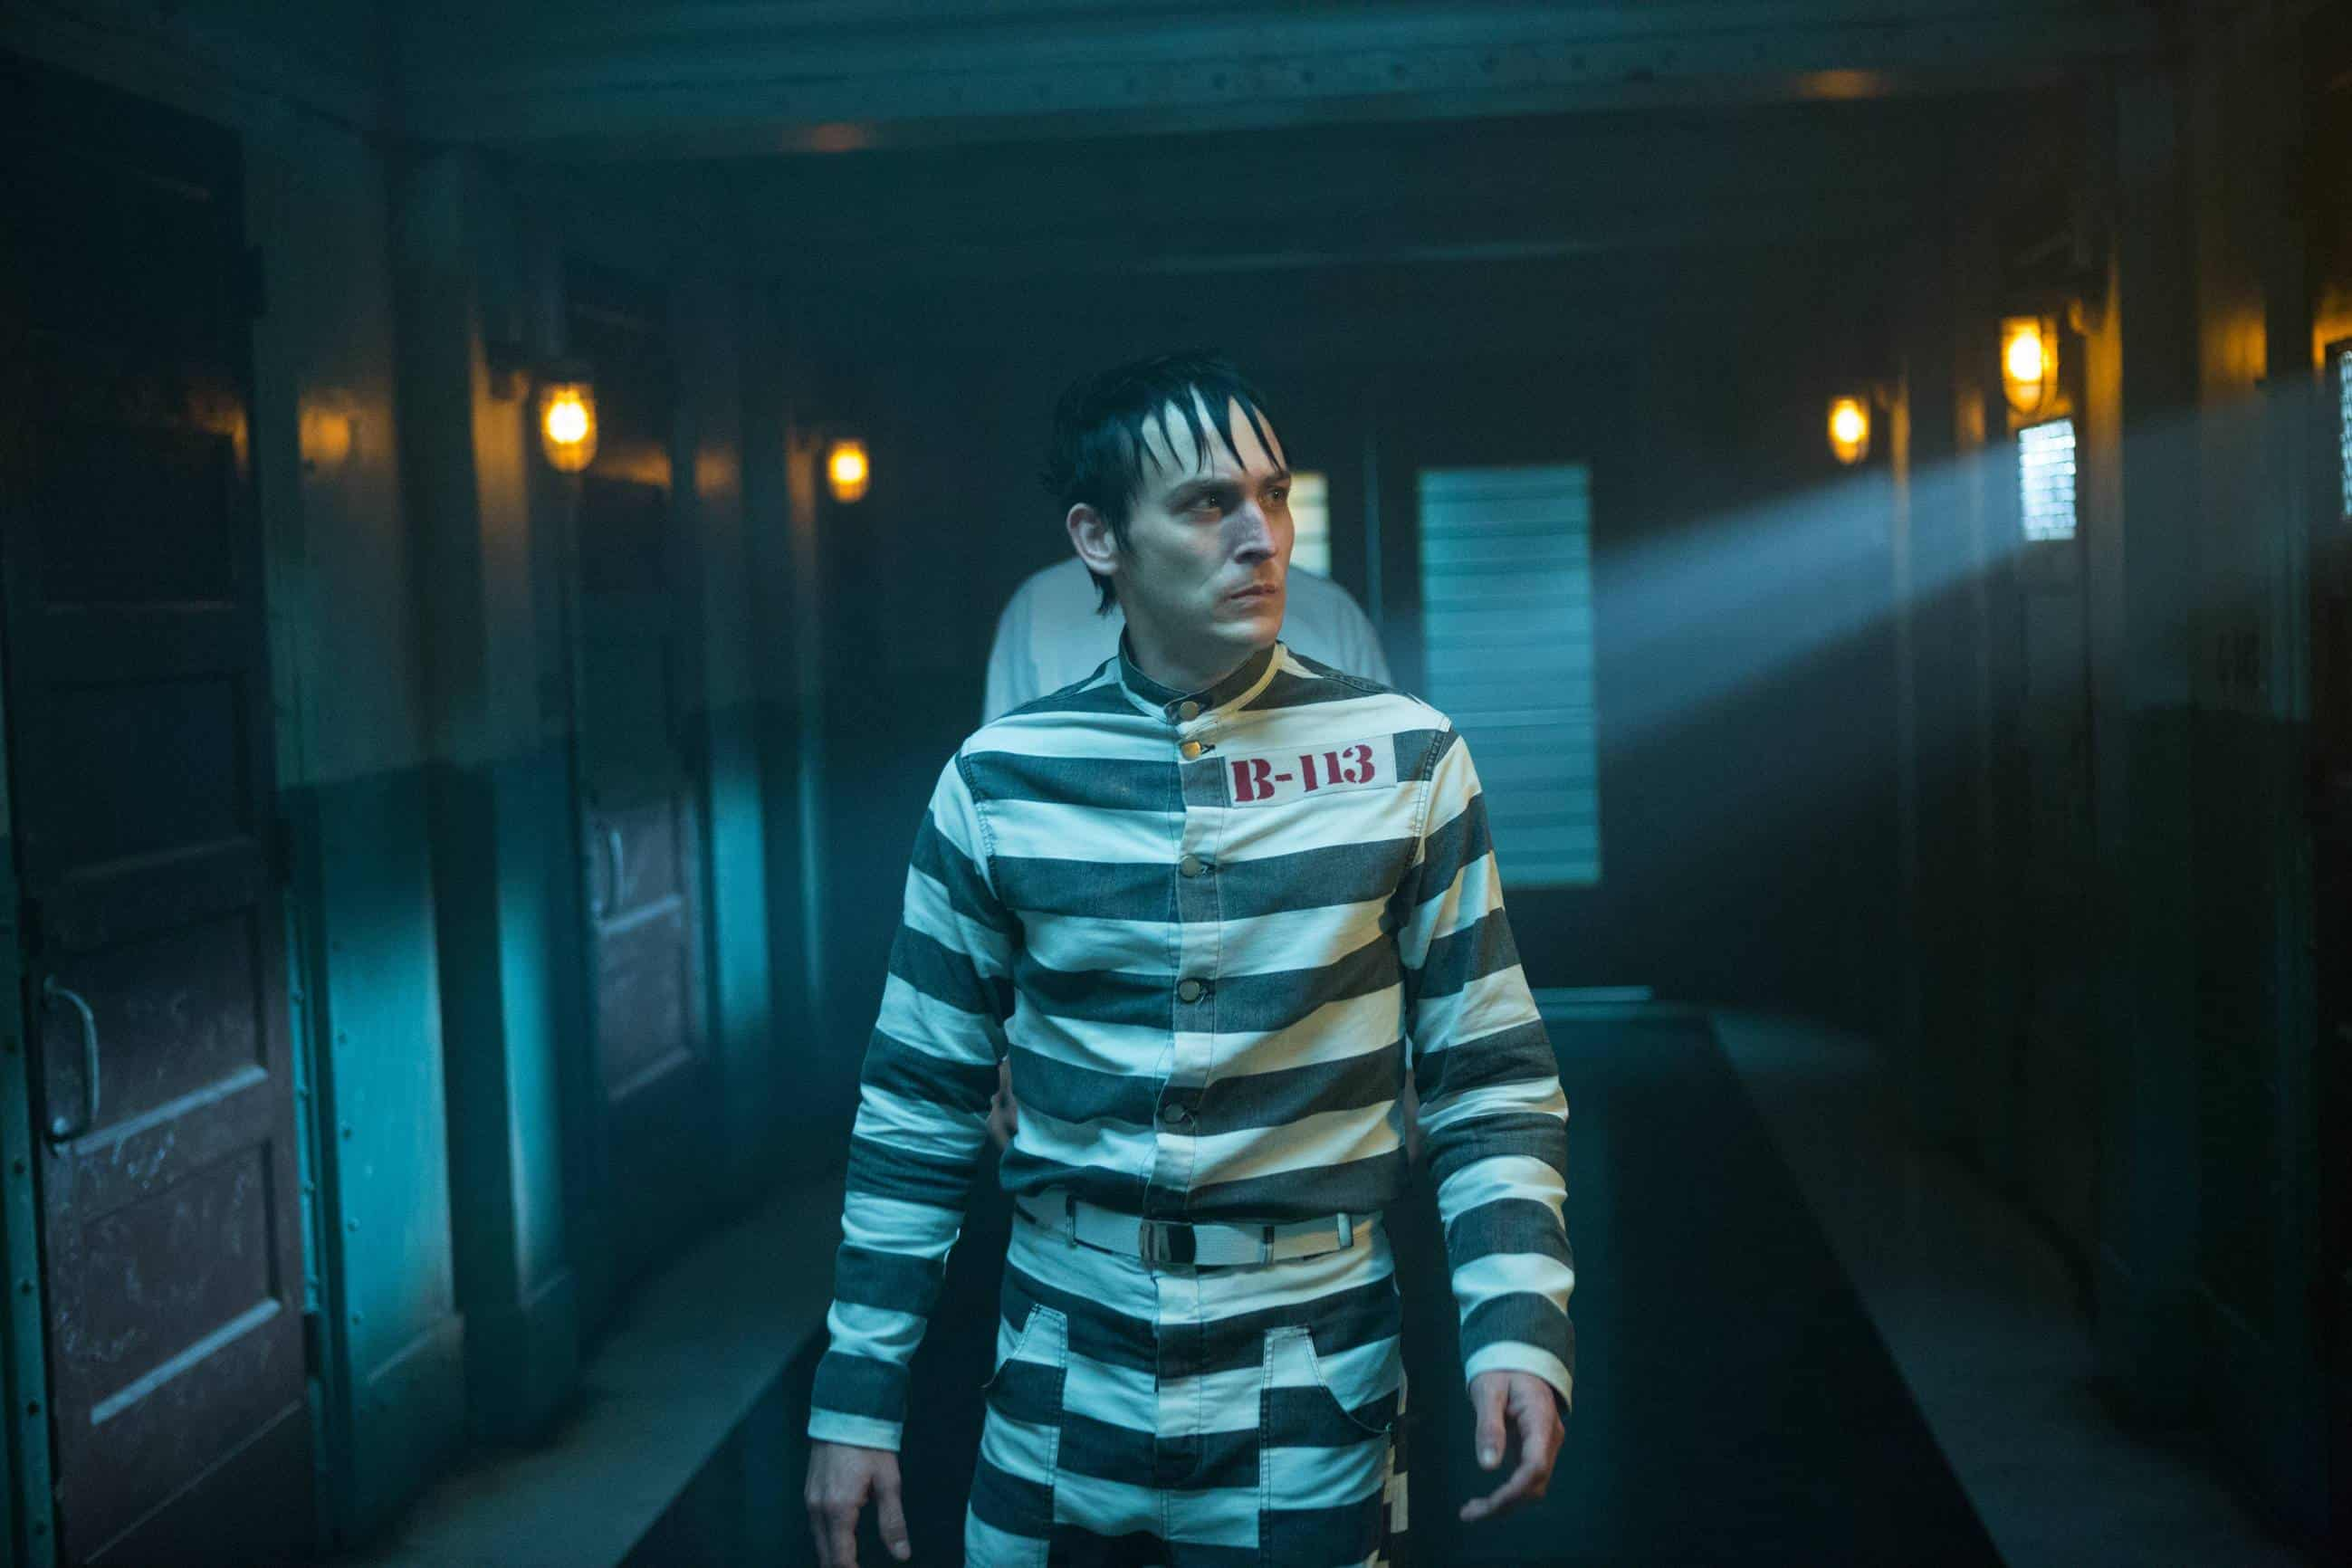 Gotham21207